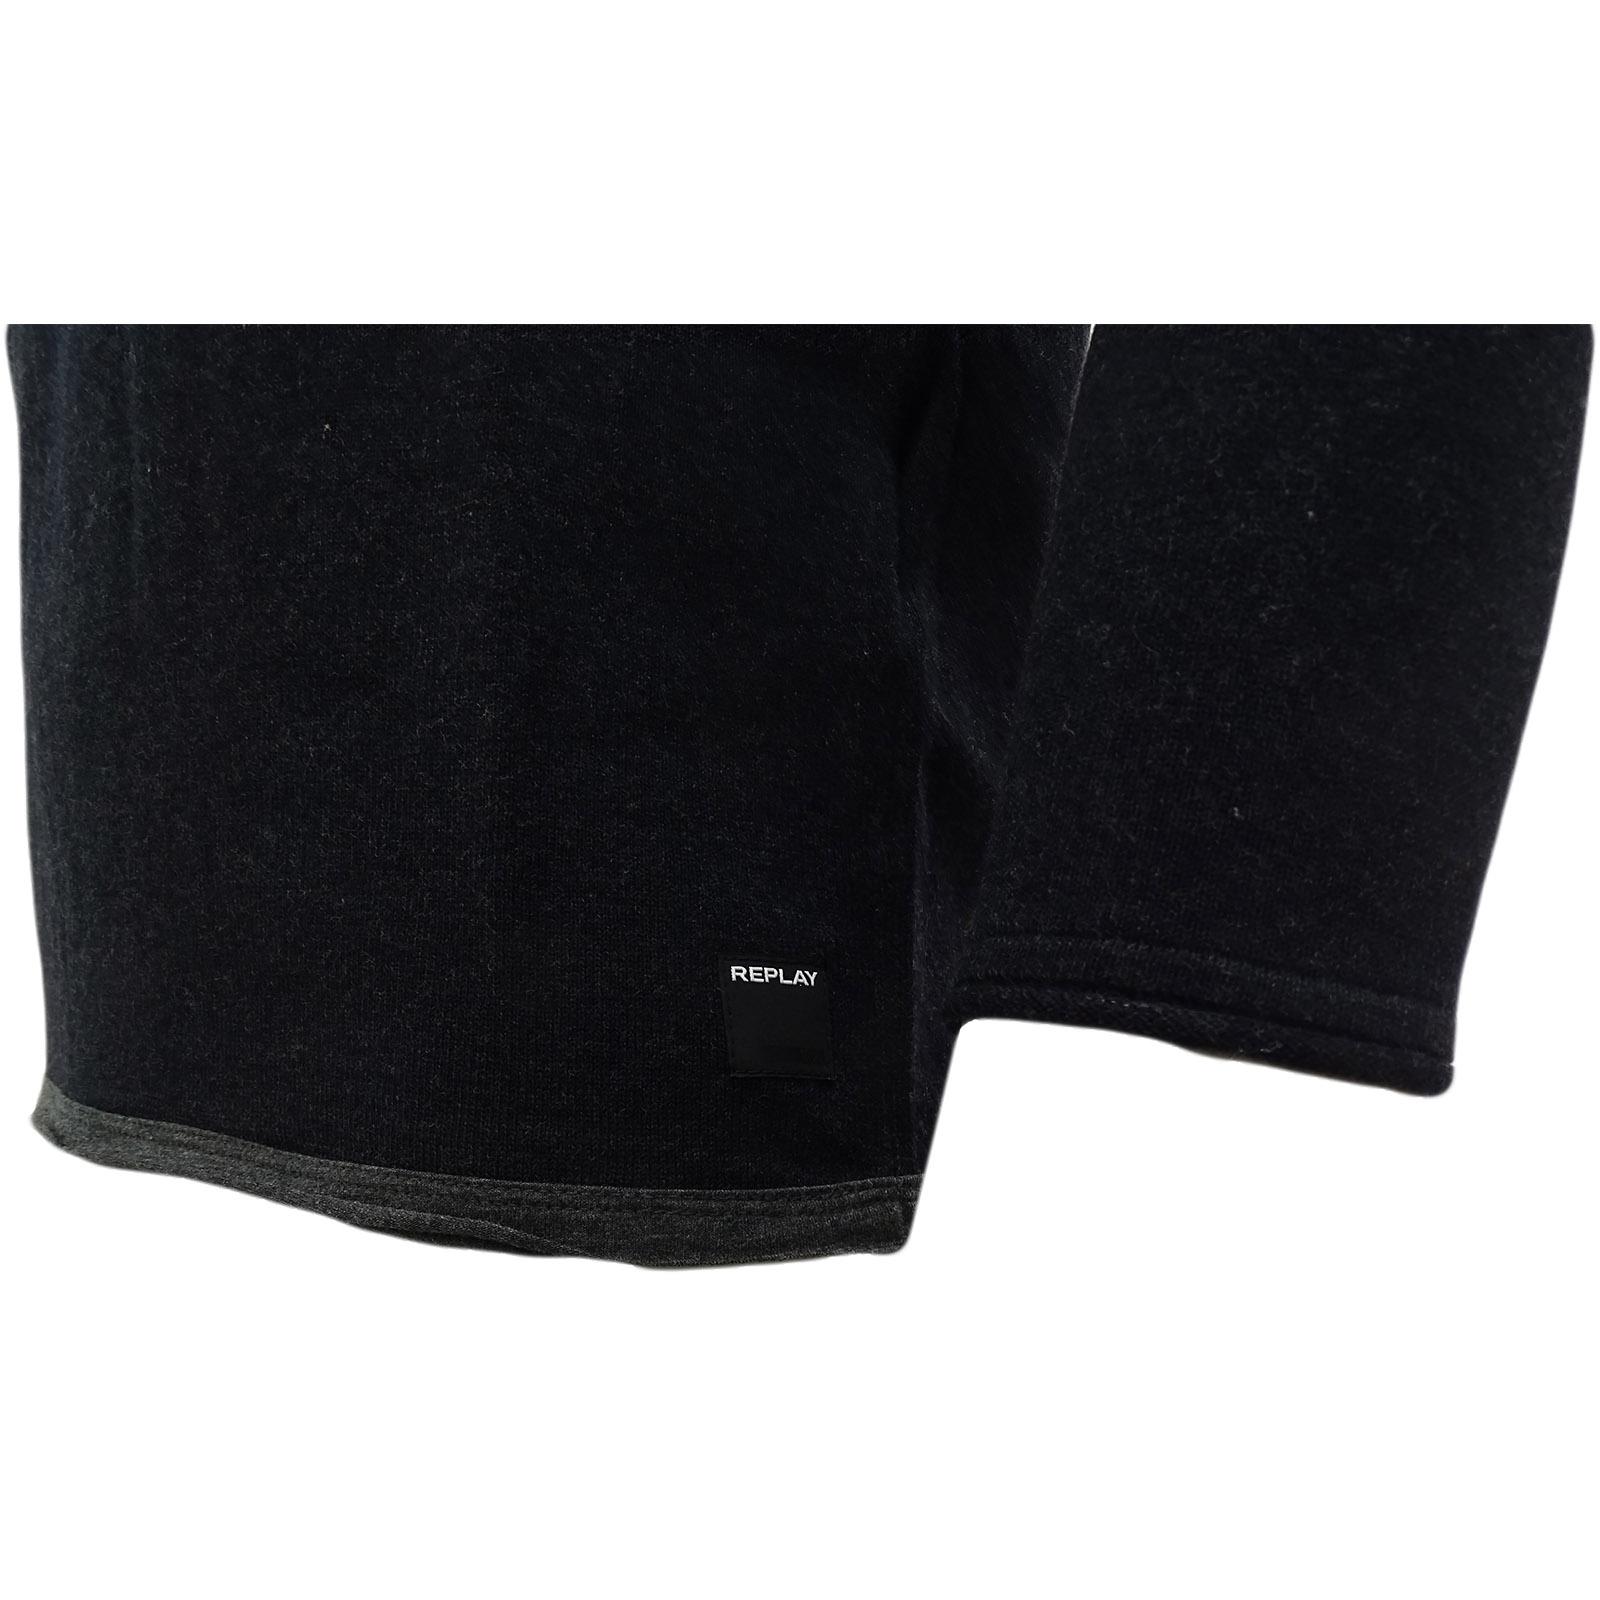 REPLAY Plain carbone facilmente LANA Plain REPLAY Jumper - 4055-m14 0f6d9b